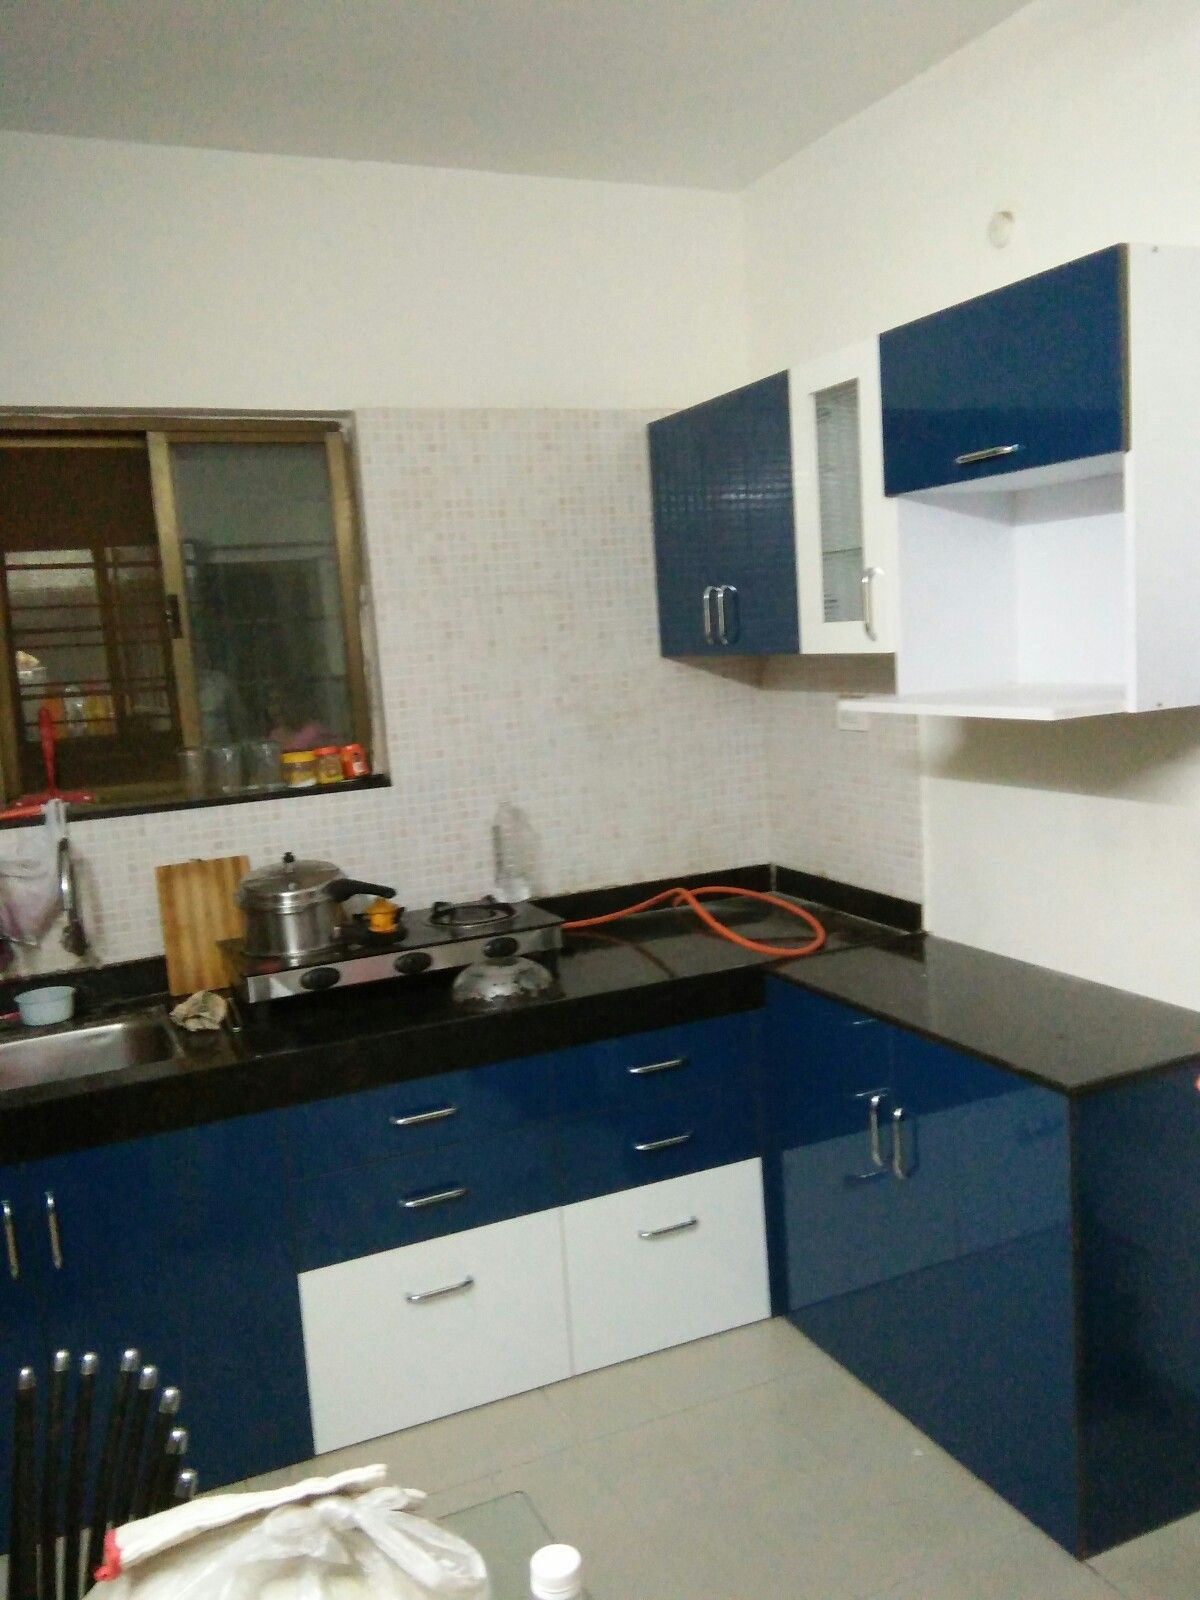 l shaped modular kitchen wall unit wall cabinets microwave cabinet swara s kitchen interior on c kitchen design id=92139